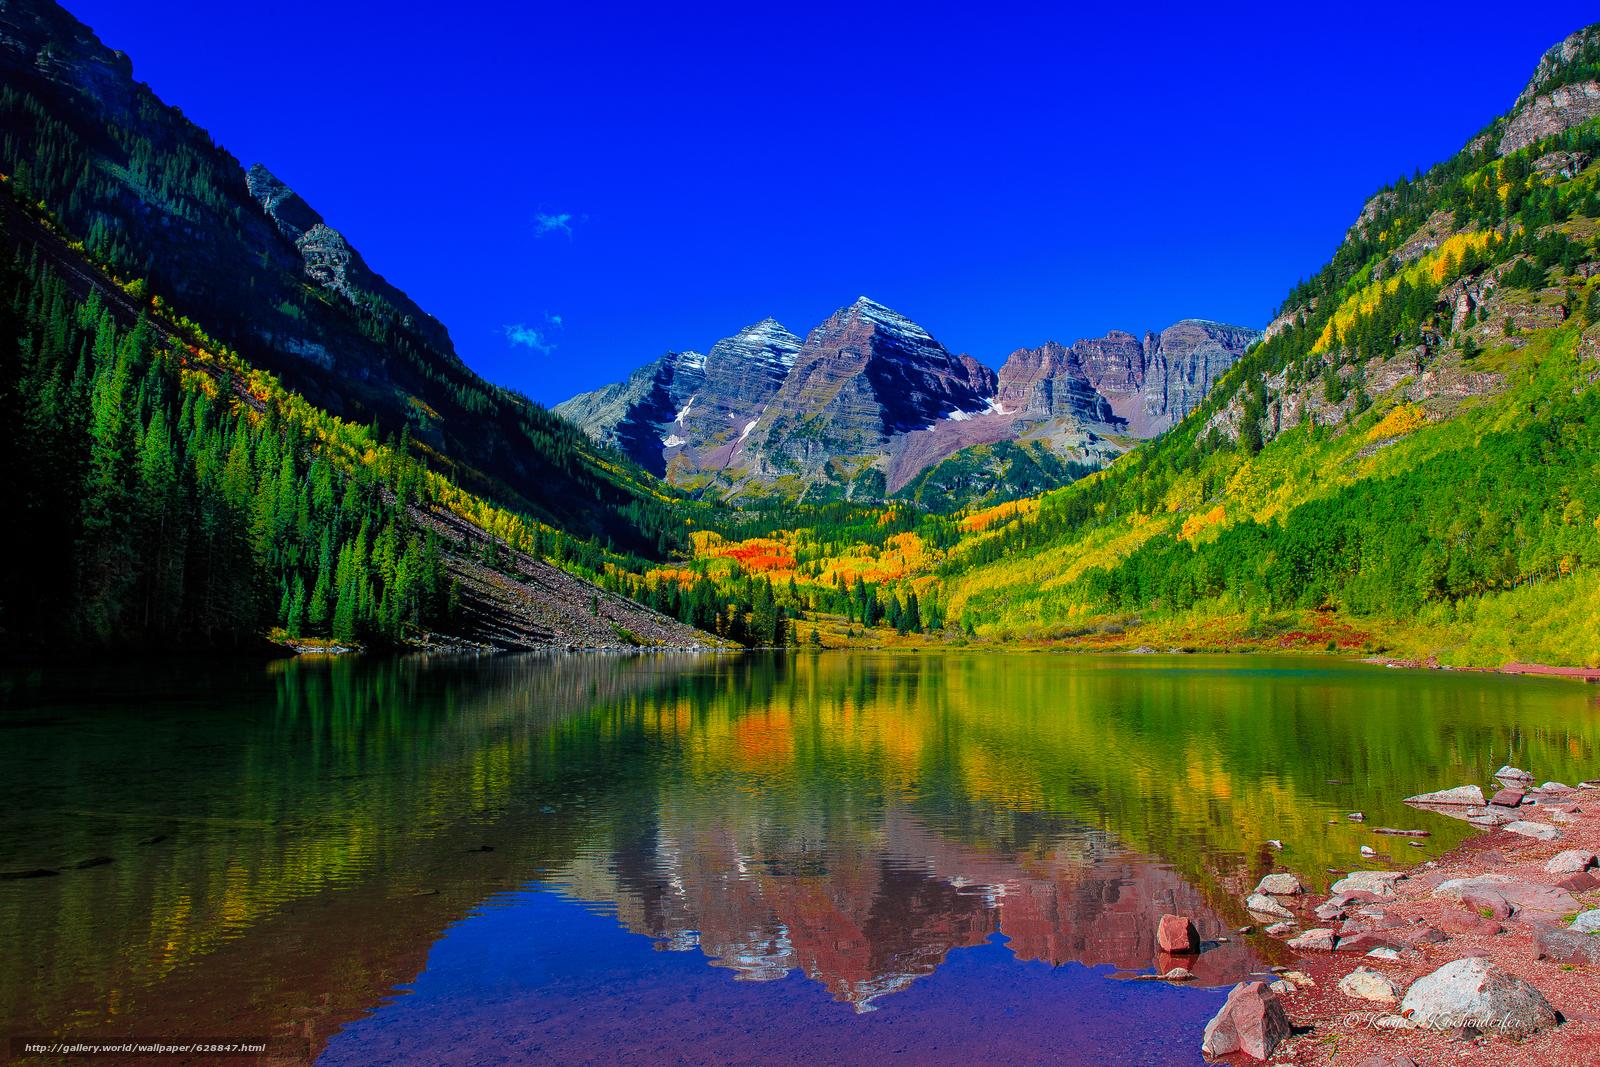 Download wallpaper Maroon Bells,  Colorado.ozero,  Mountains,  trees free desktop wallpaper in the resolution 5402x3601 — picture №628847